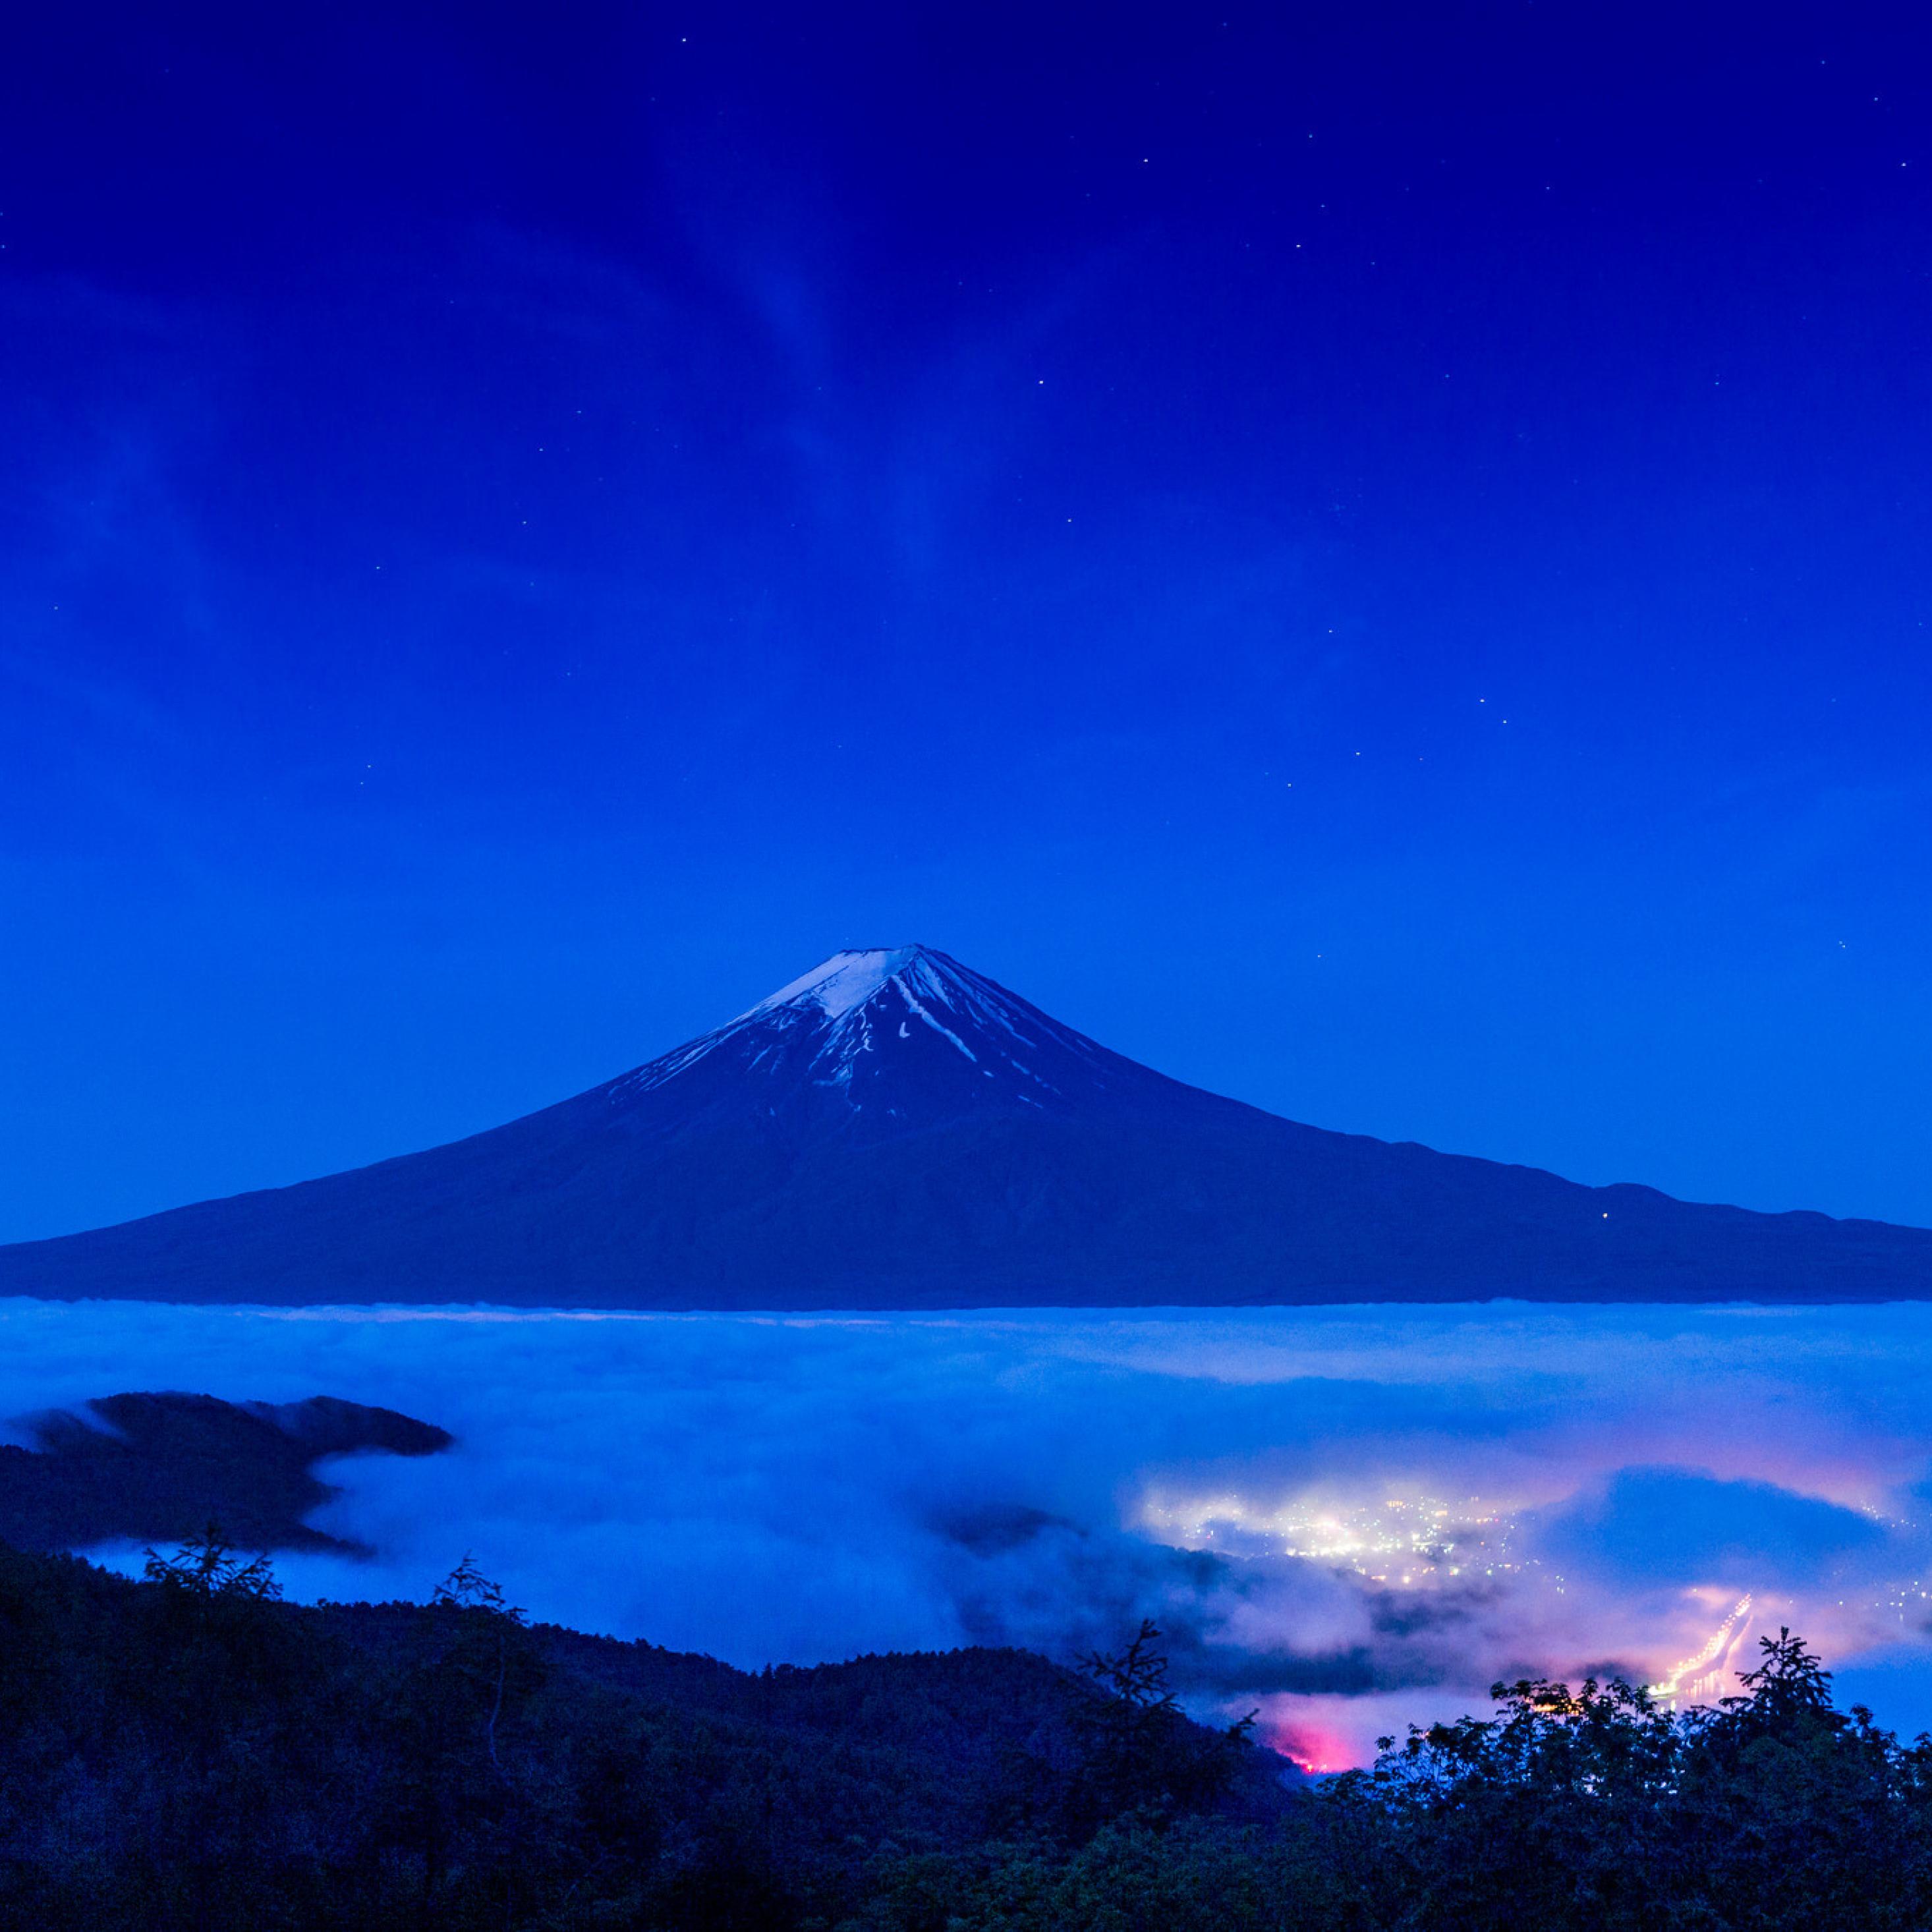 Mount Hd Wallpaper: Mount Fuji Beautiful Shot, Full HD 2K Wallpaper